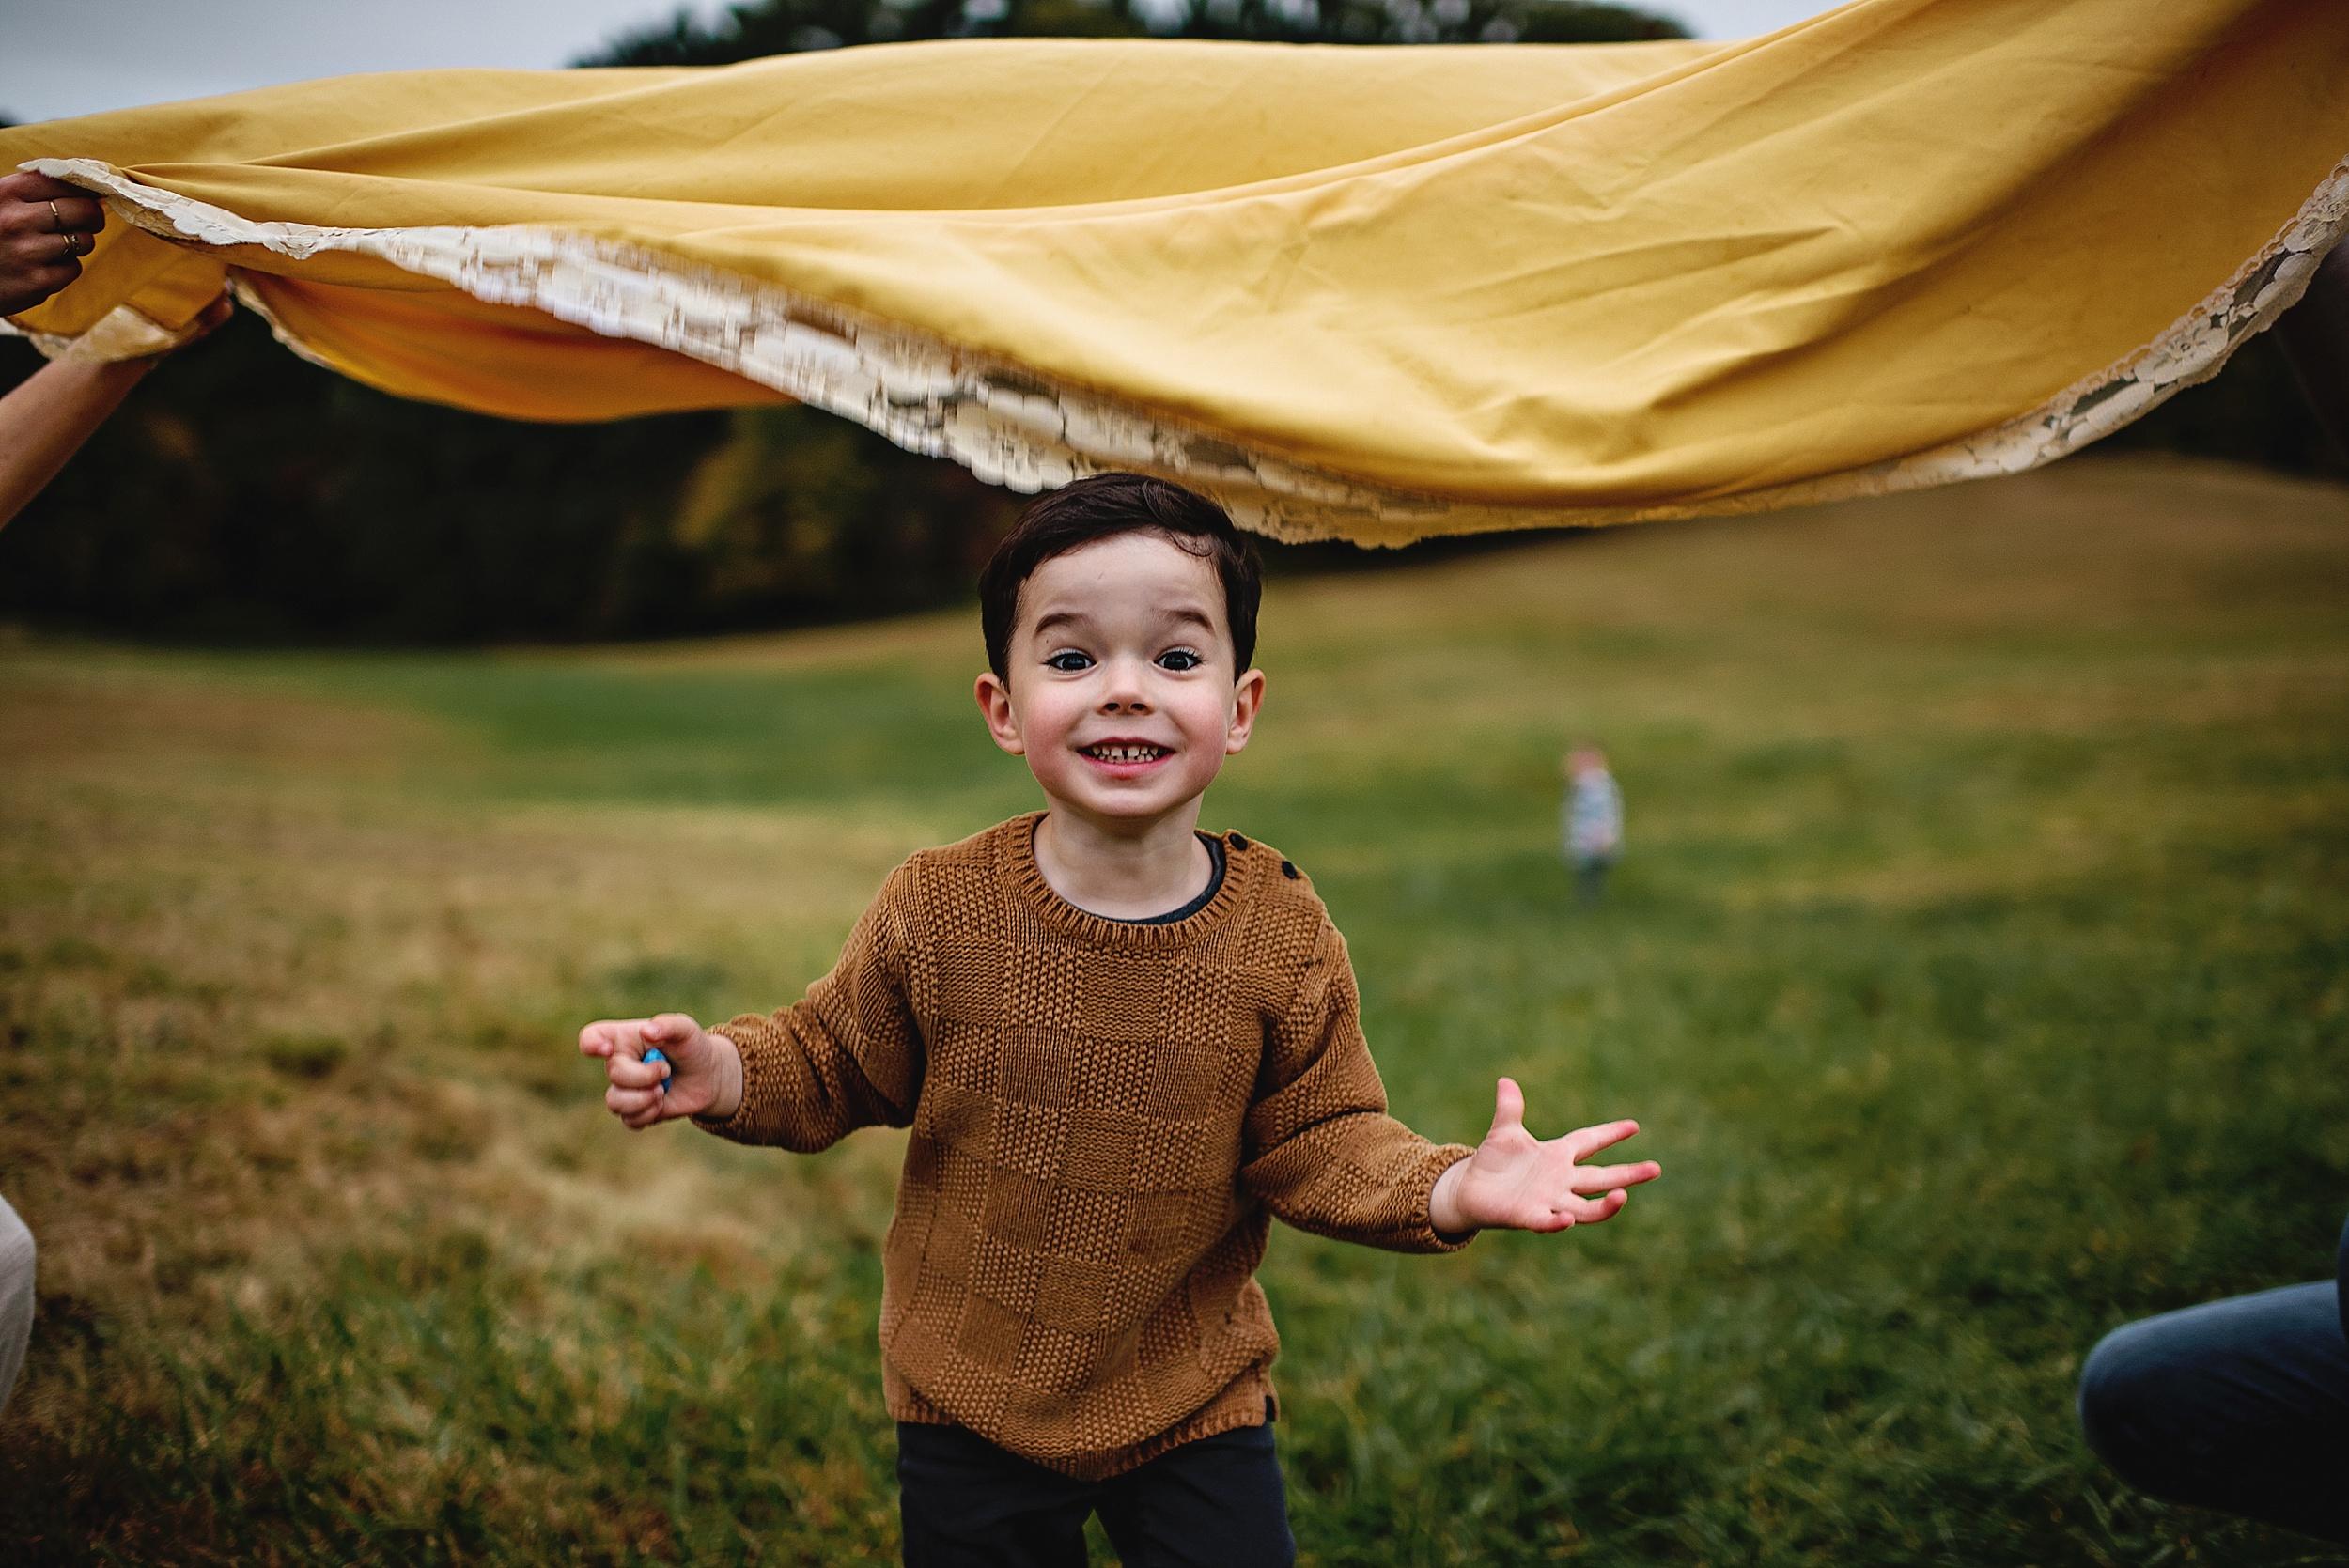 lauren-grayson-photography-portrait-artist-akron-cleveland-ohio-photographer-family-session-fields-sunset-fall_0199.jpg